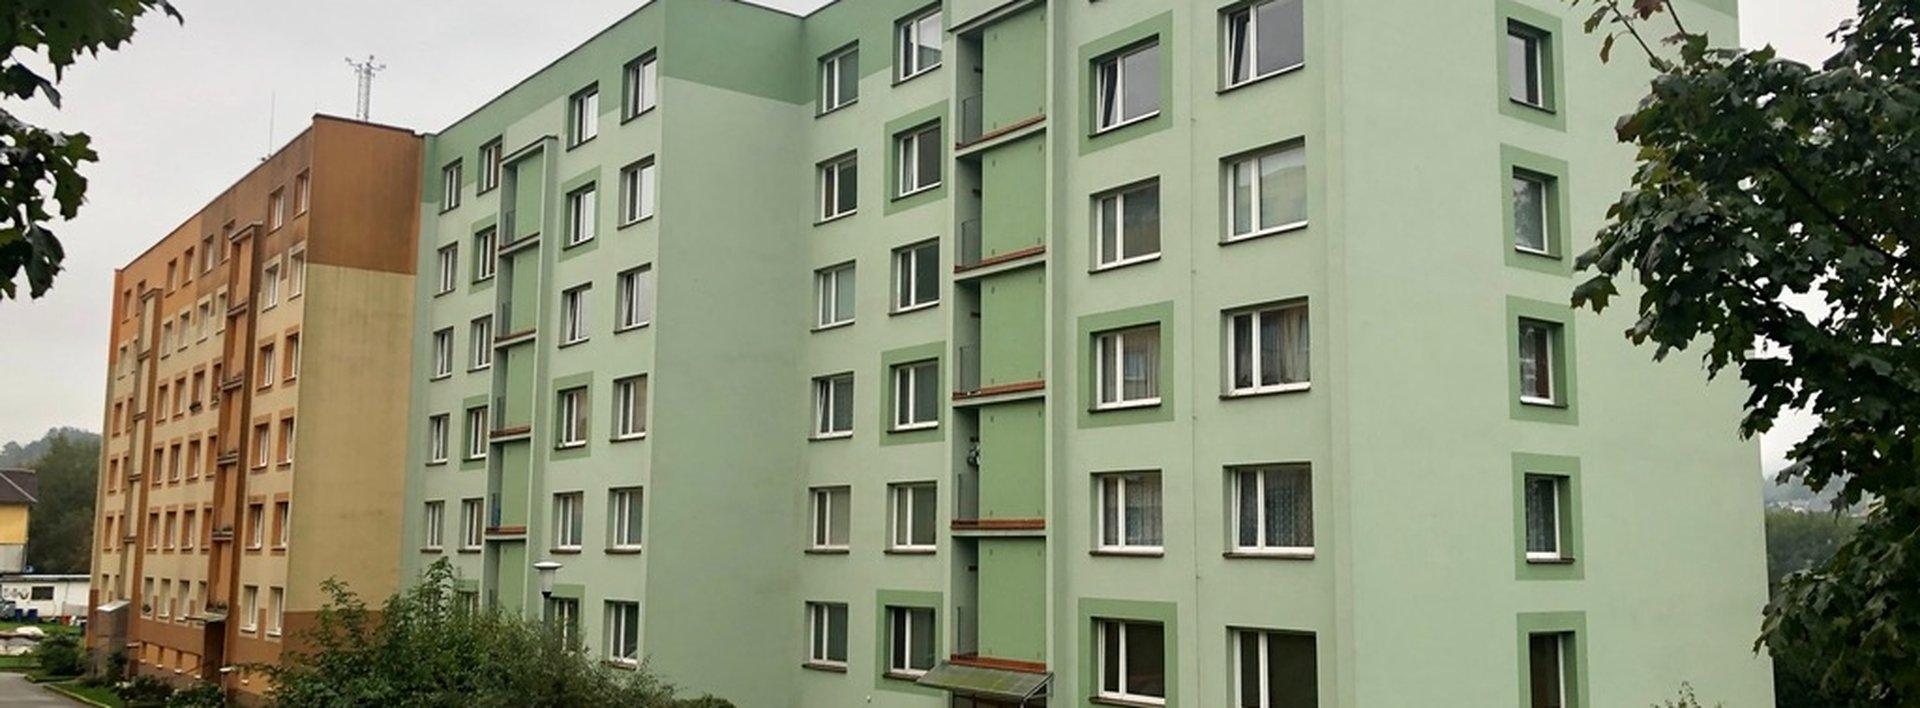 Prodej bytu 3+1, 65 m² - Liberec - Vratislavice n/N., ul. Vnitřní, Ev.č.: N49187